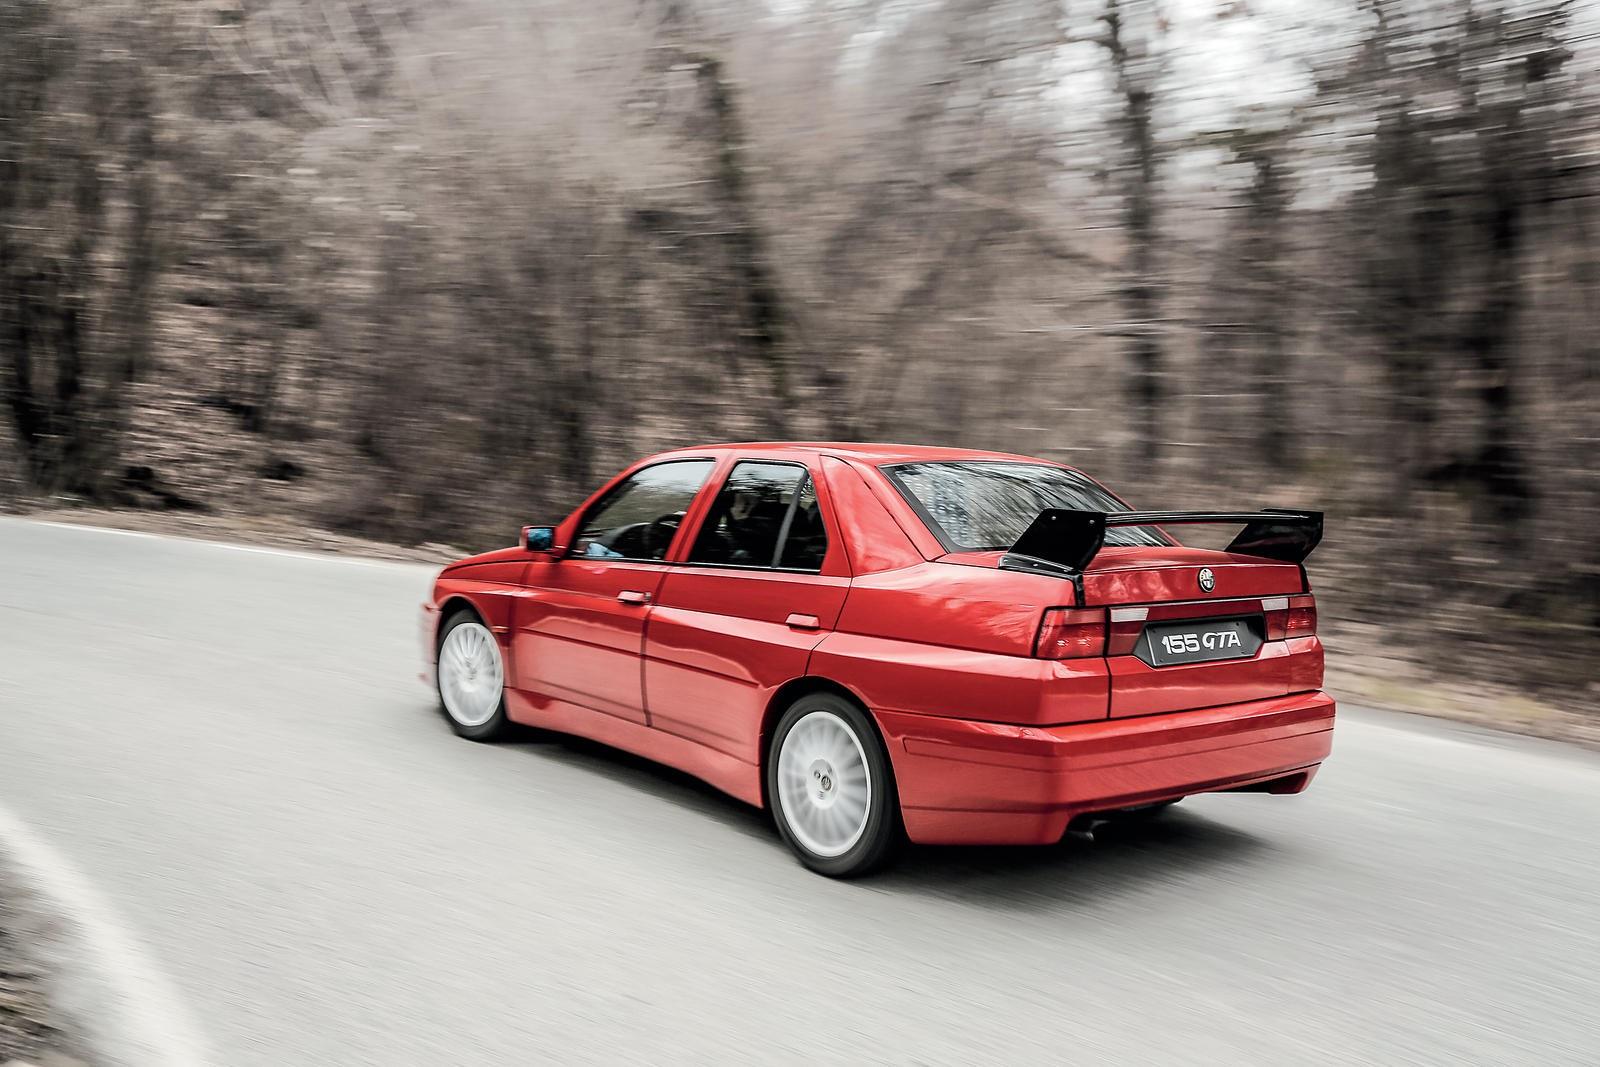 1993 Alfa Romeo 155 GTA Stradale Sports Saloon rear 3/4